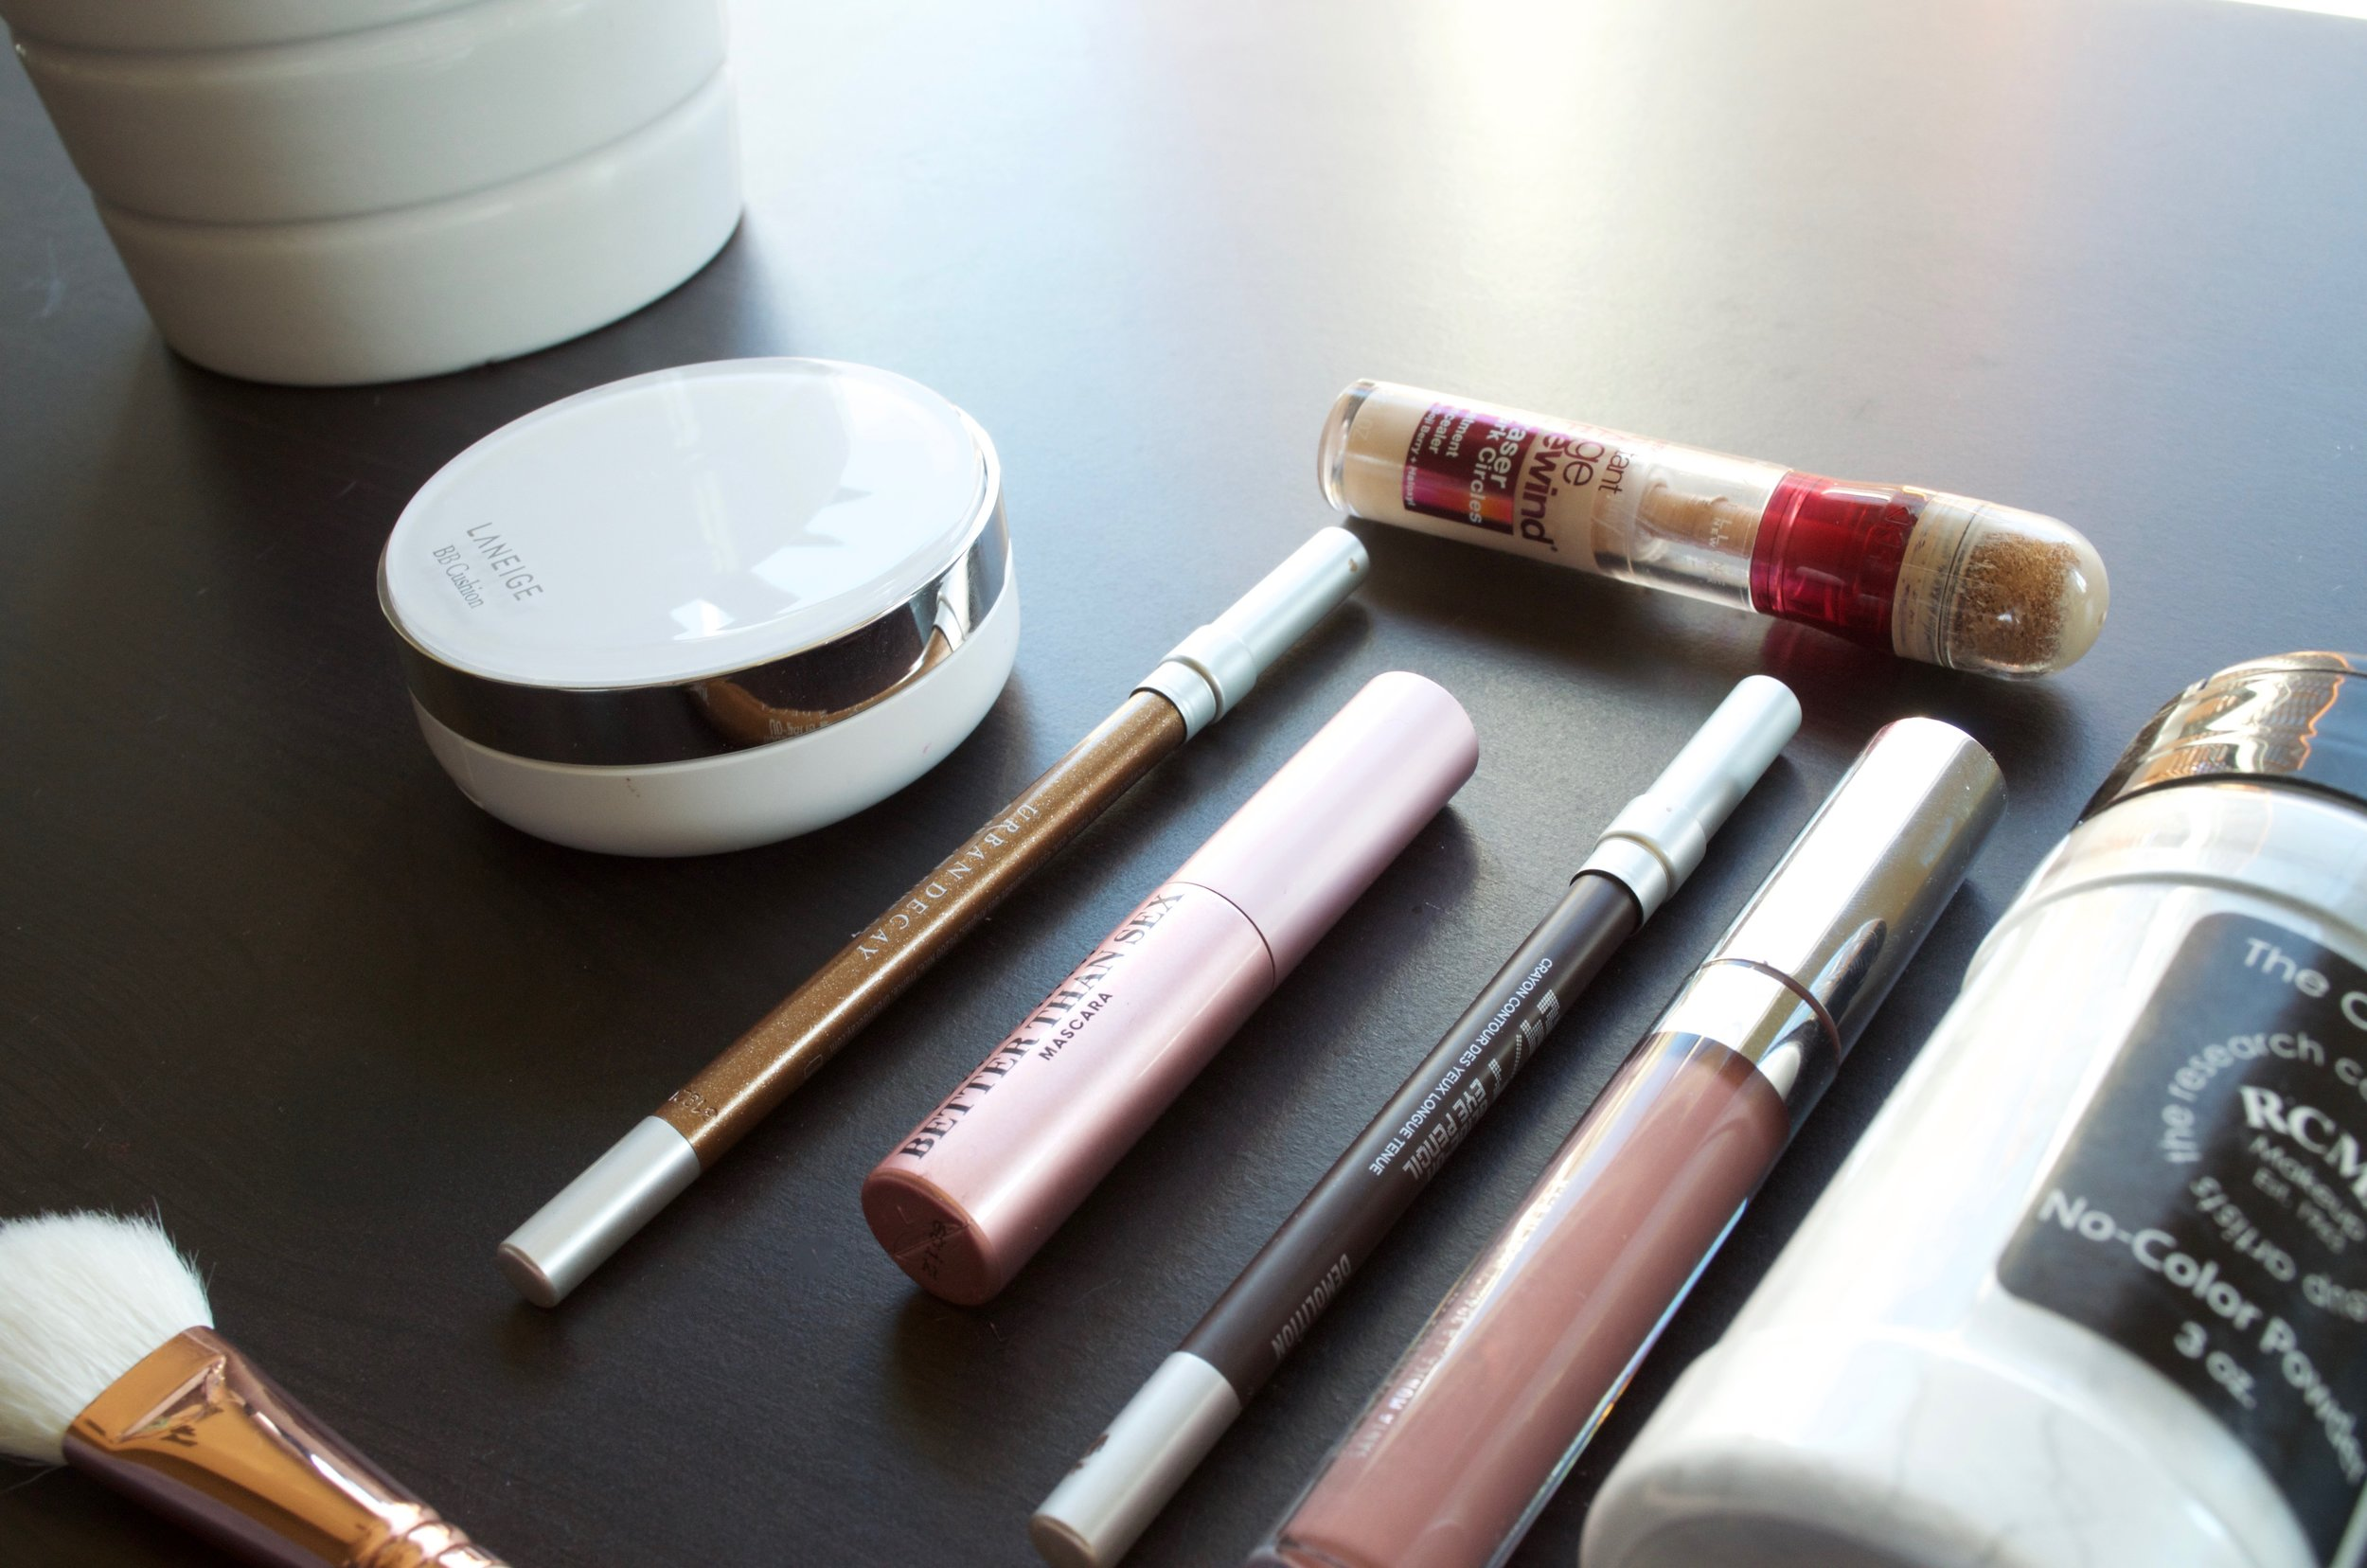 Intro to Makeup 101